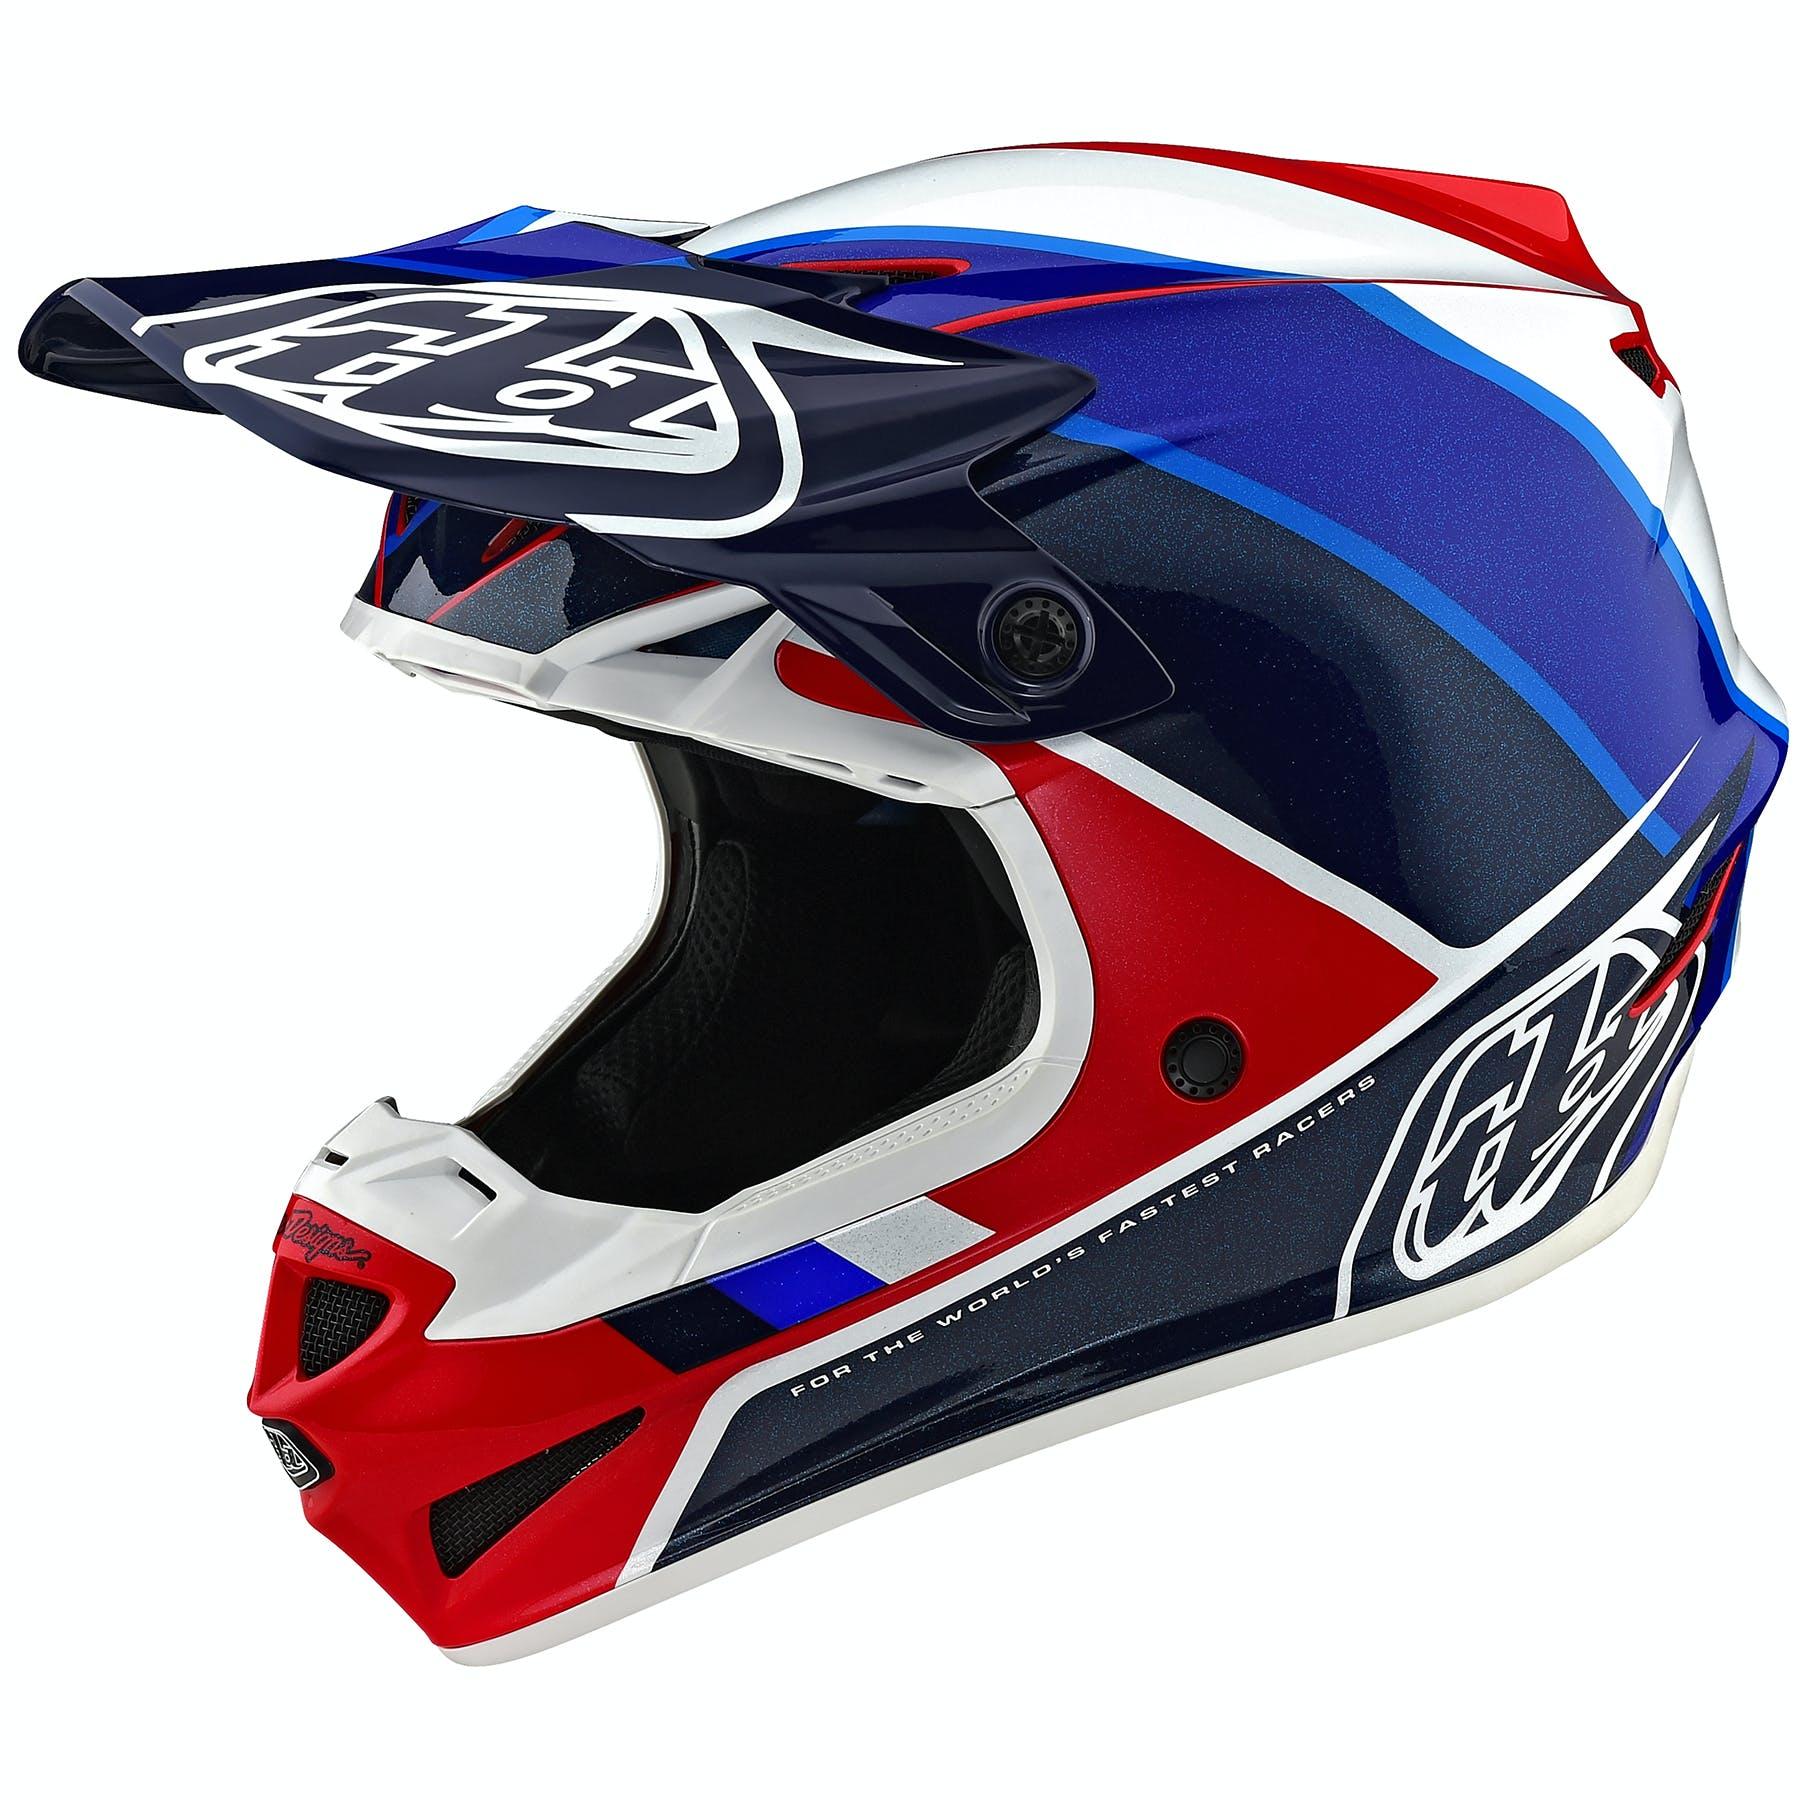 TROY LEE DESIGNS TLD MENS RED POP WHEELIES MX MOTO AIR GLOVES size S M L XL 2X